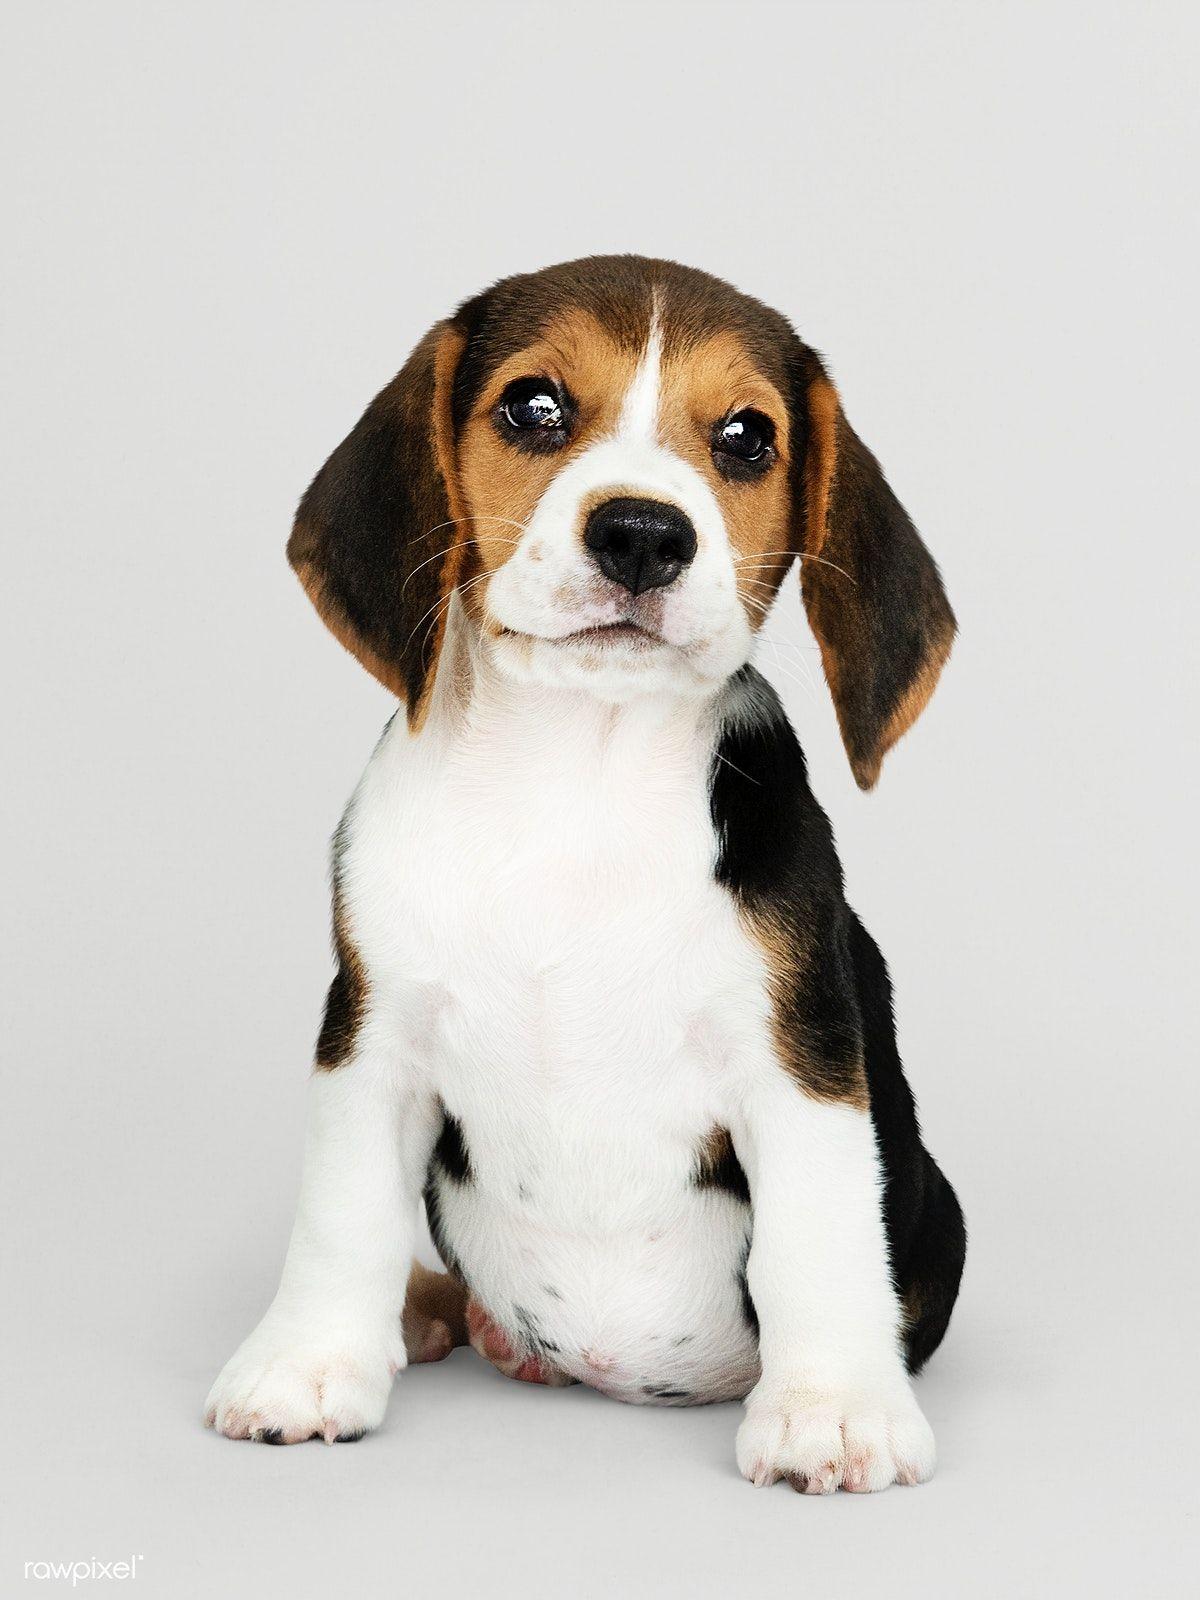 Download Premium Image Of Adorable Beagle Puppy Solo Portrait